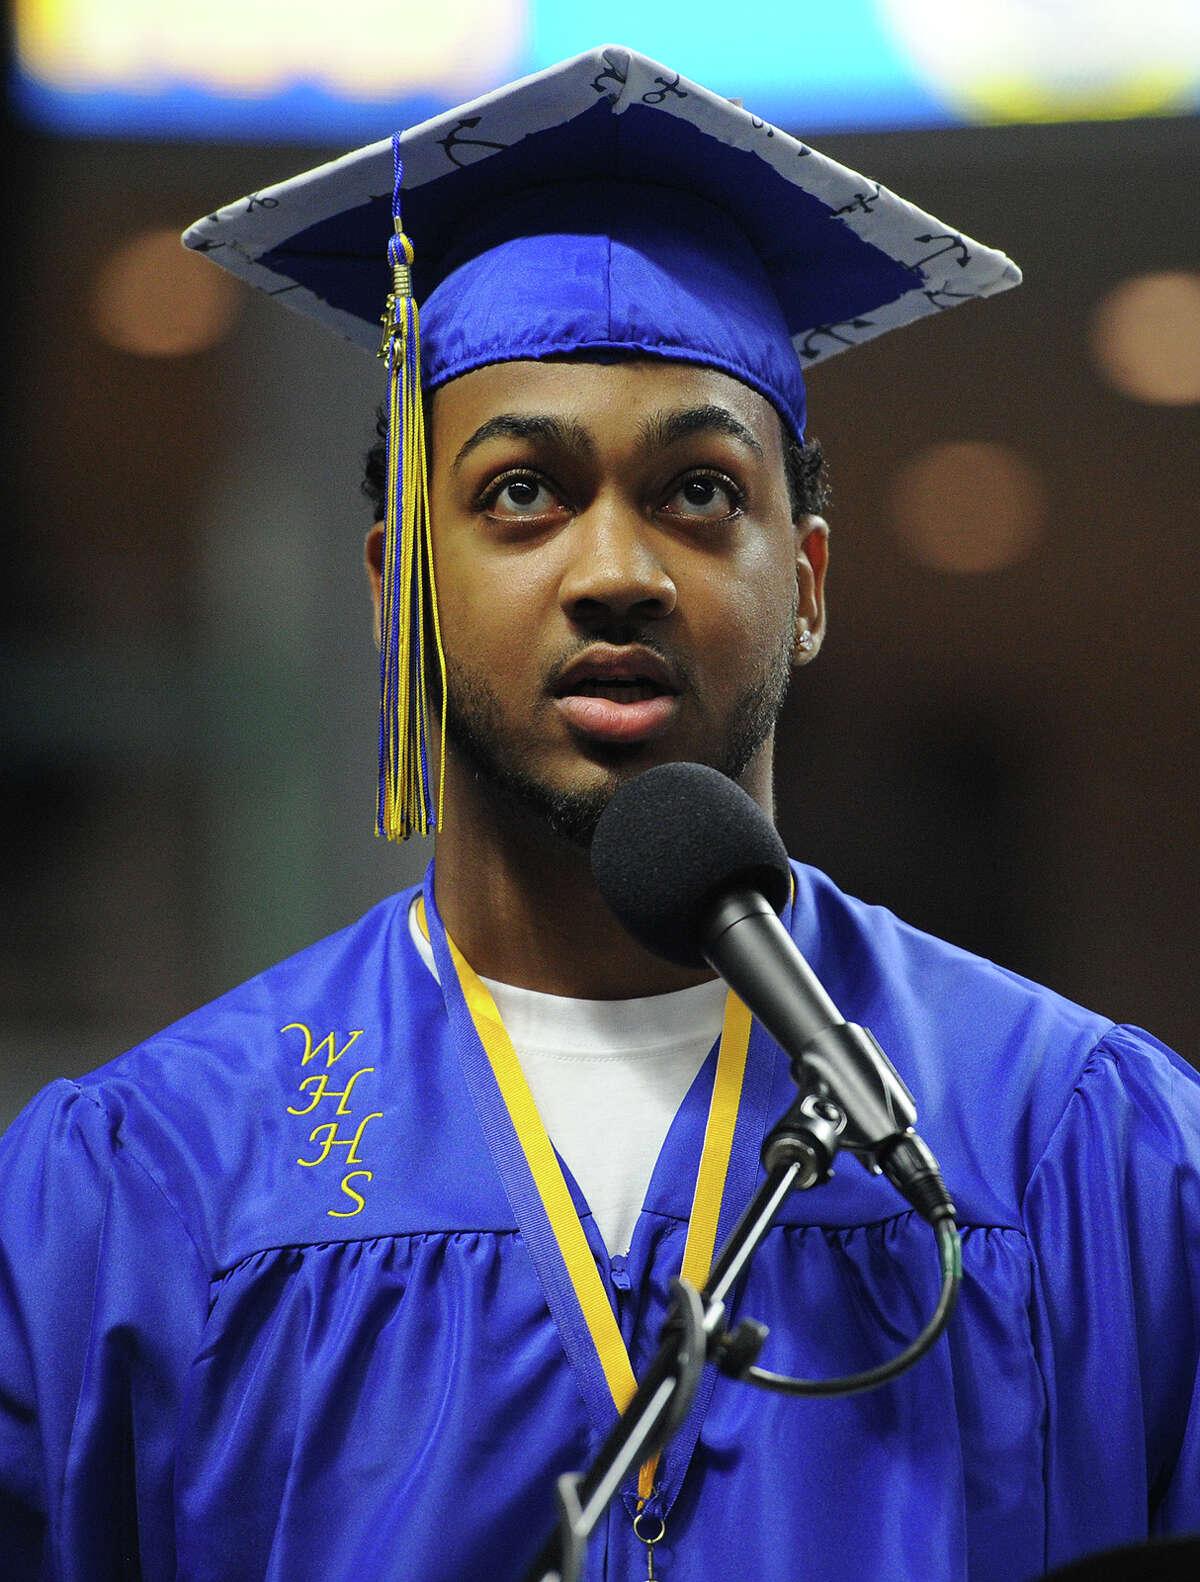 Harding High School Graduation at the Webster Bank Arena in Bridgeport, Conn. on Monday, June 22, 2015.